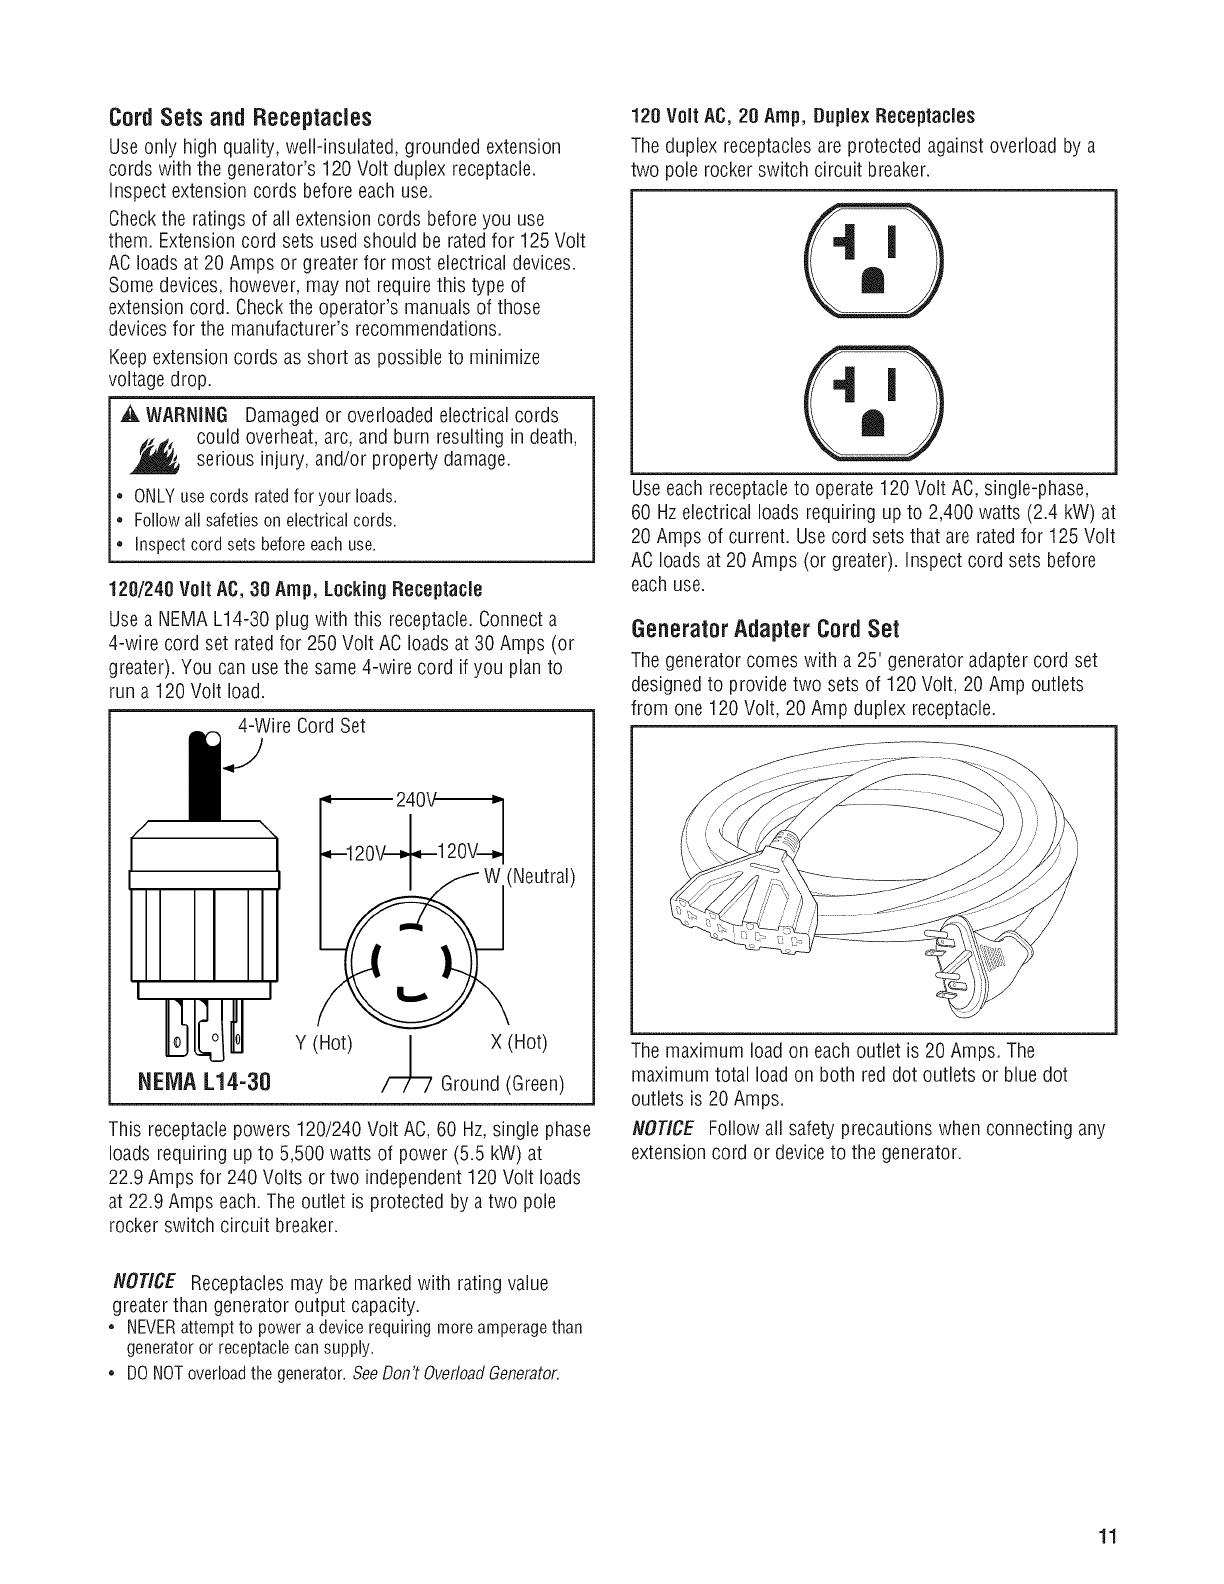 Briggs Stratton 030430b 01 User Manual Generator Manuals And 240 Volt 20 Amp Wiring Diagram Cordsets Andreceptacles